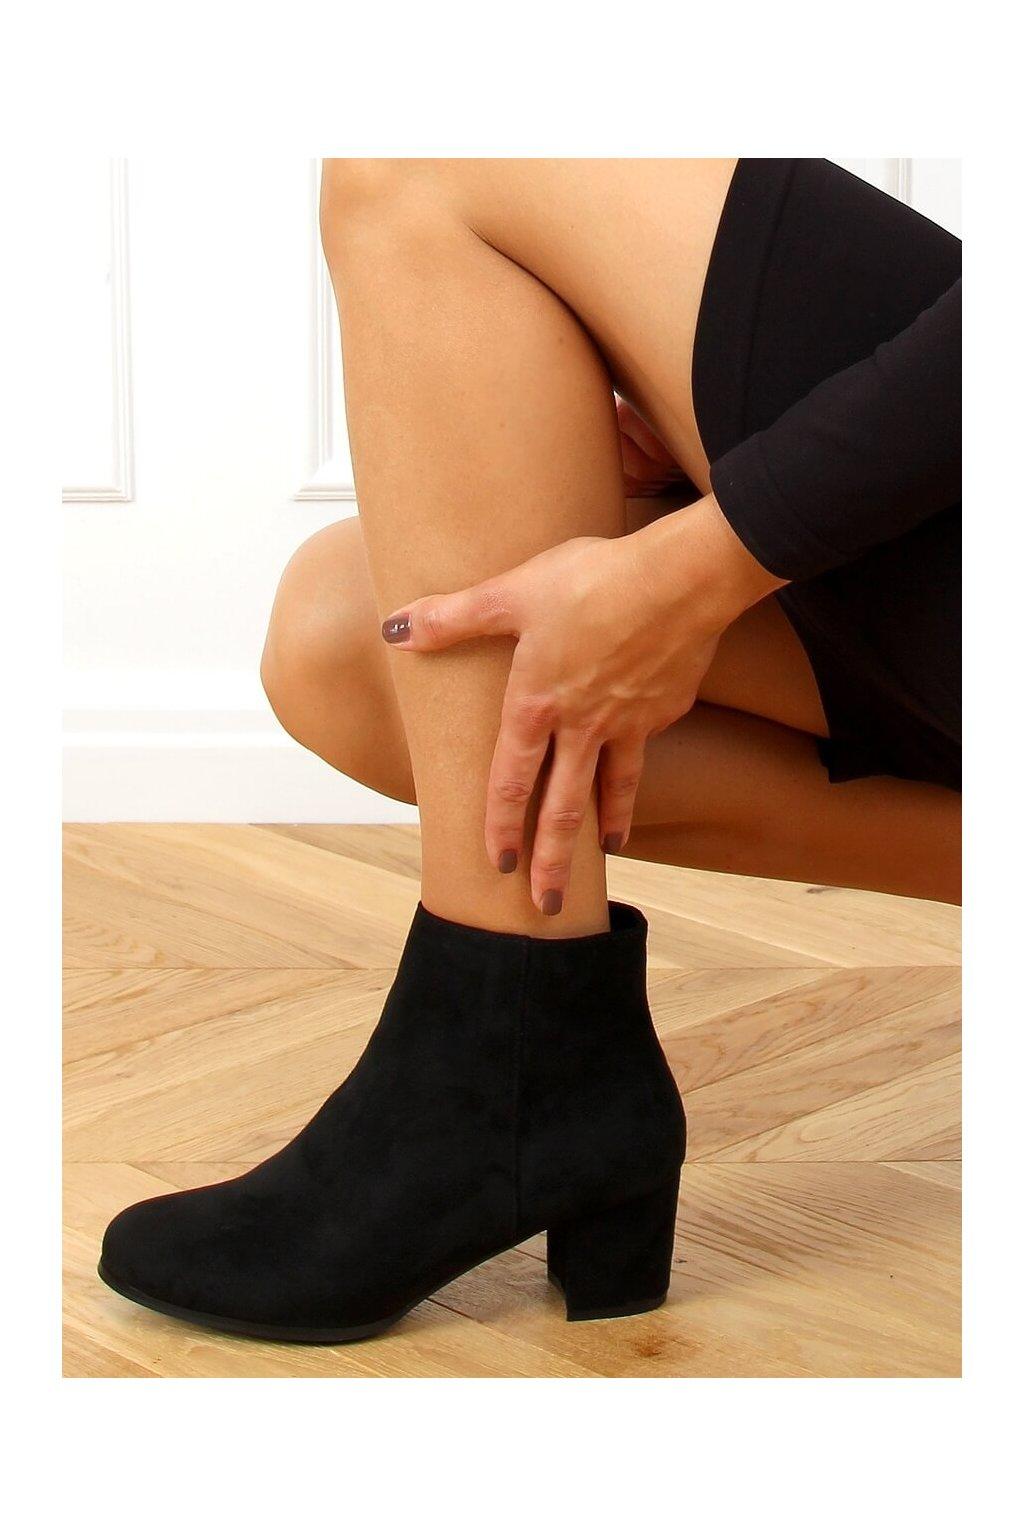 Dámske členkové topánky čierne na širokom podpätku MM788